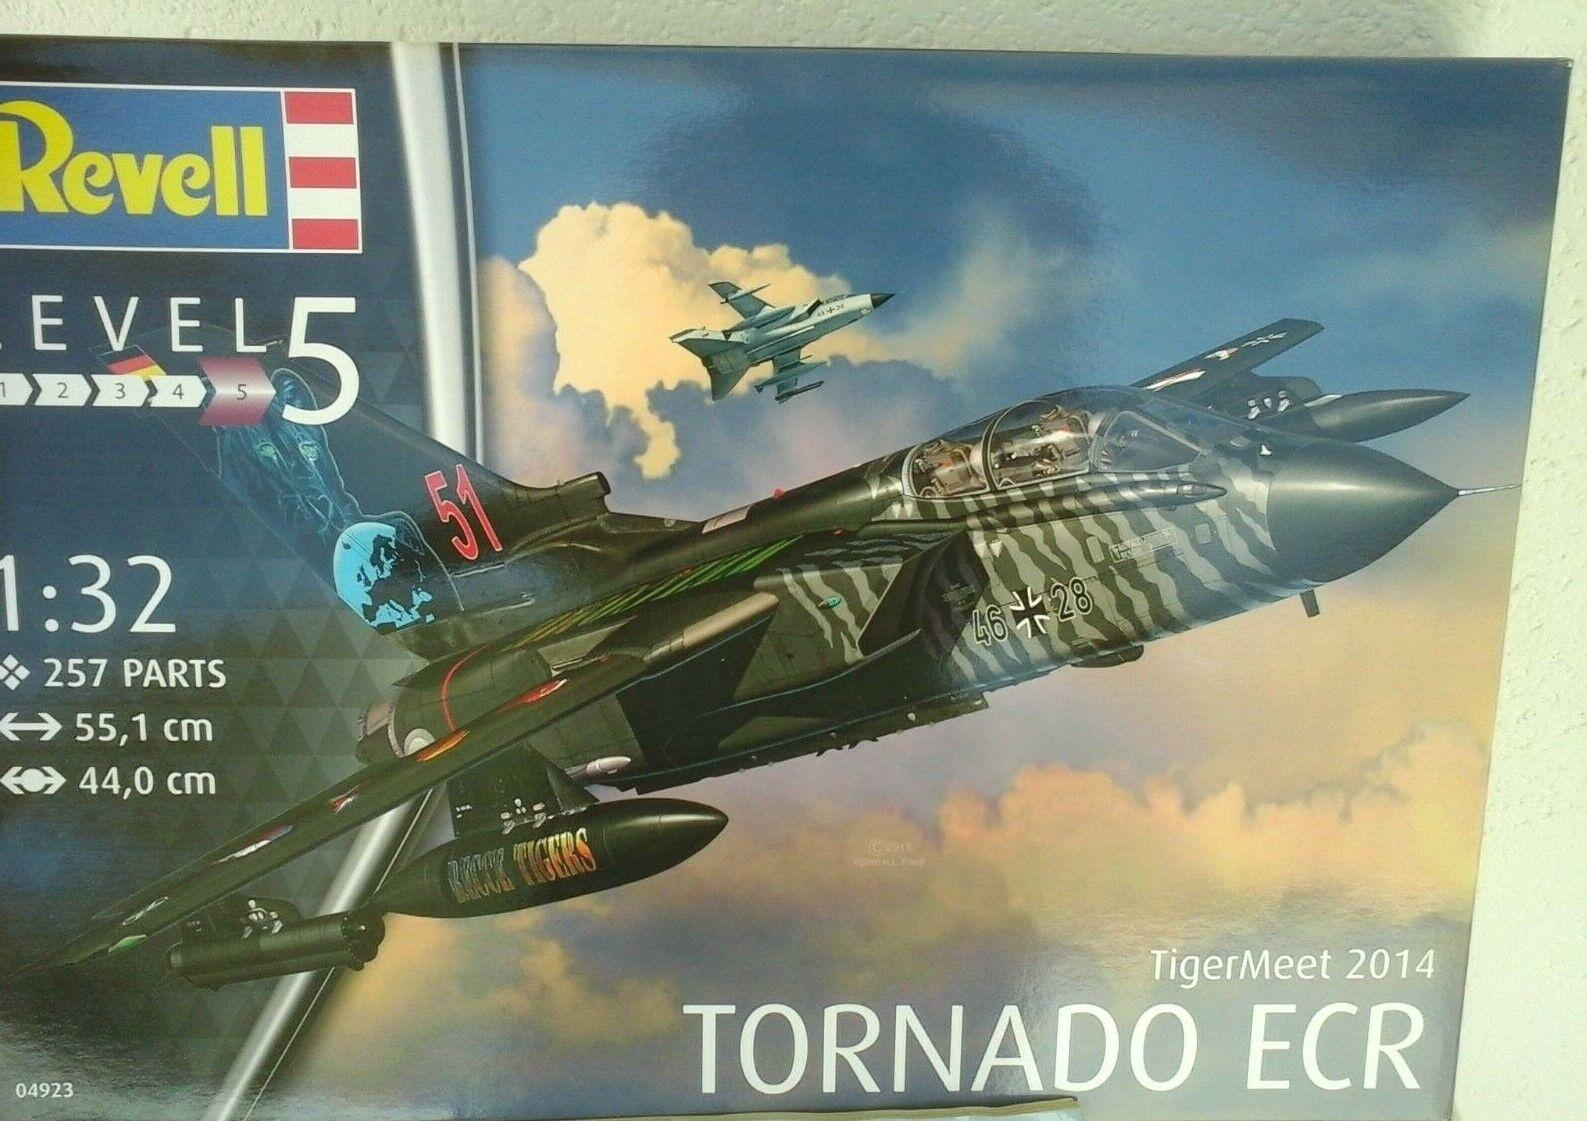 TORNADO ECR TIGER MEET 2014-1 32 SCALE REVELL MODEL